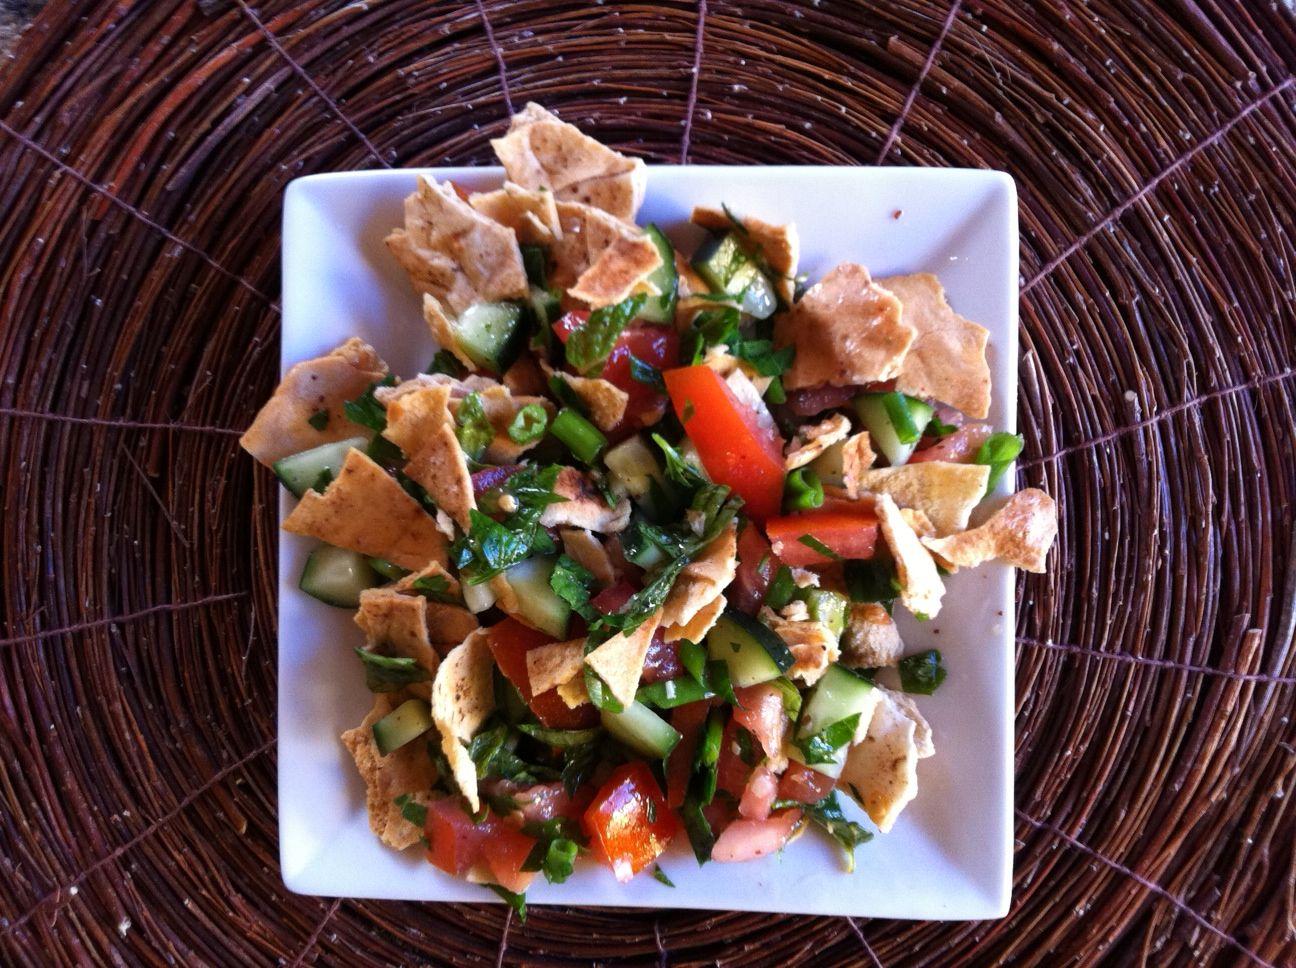 Pita Bread Salad on a plate